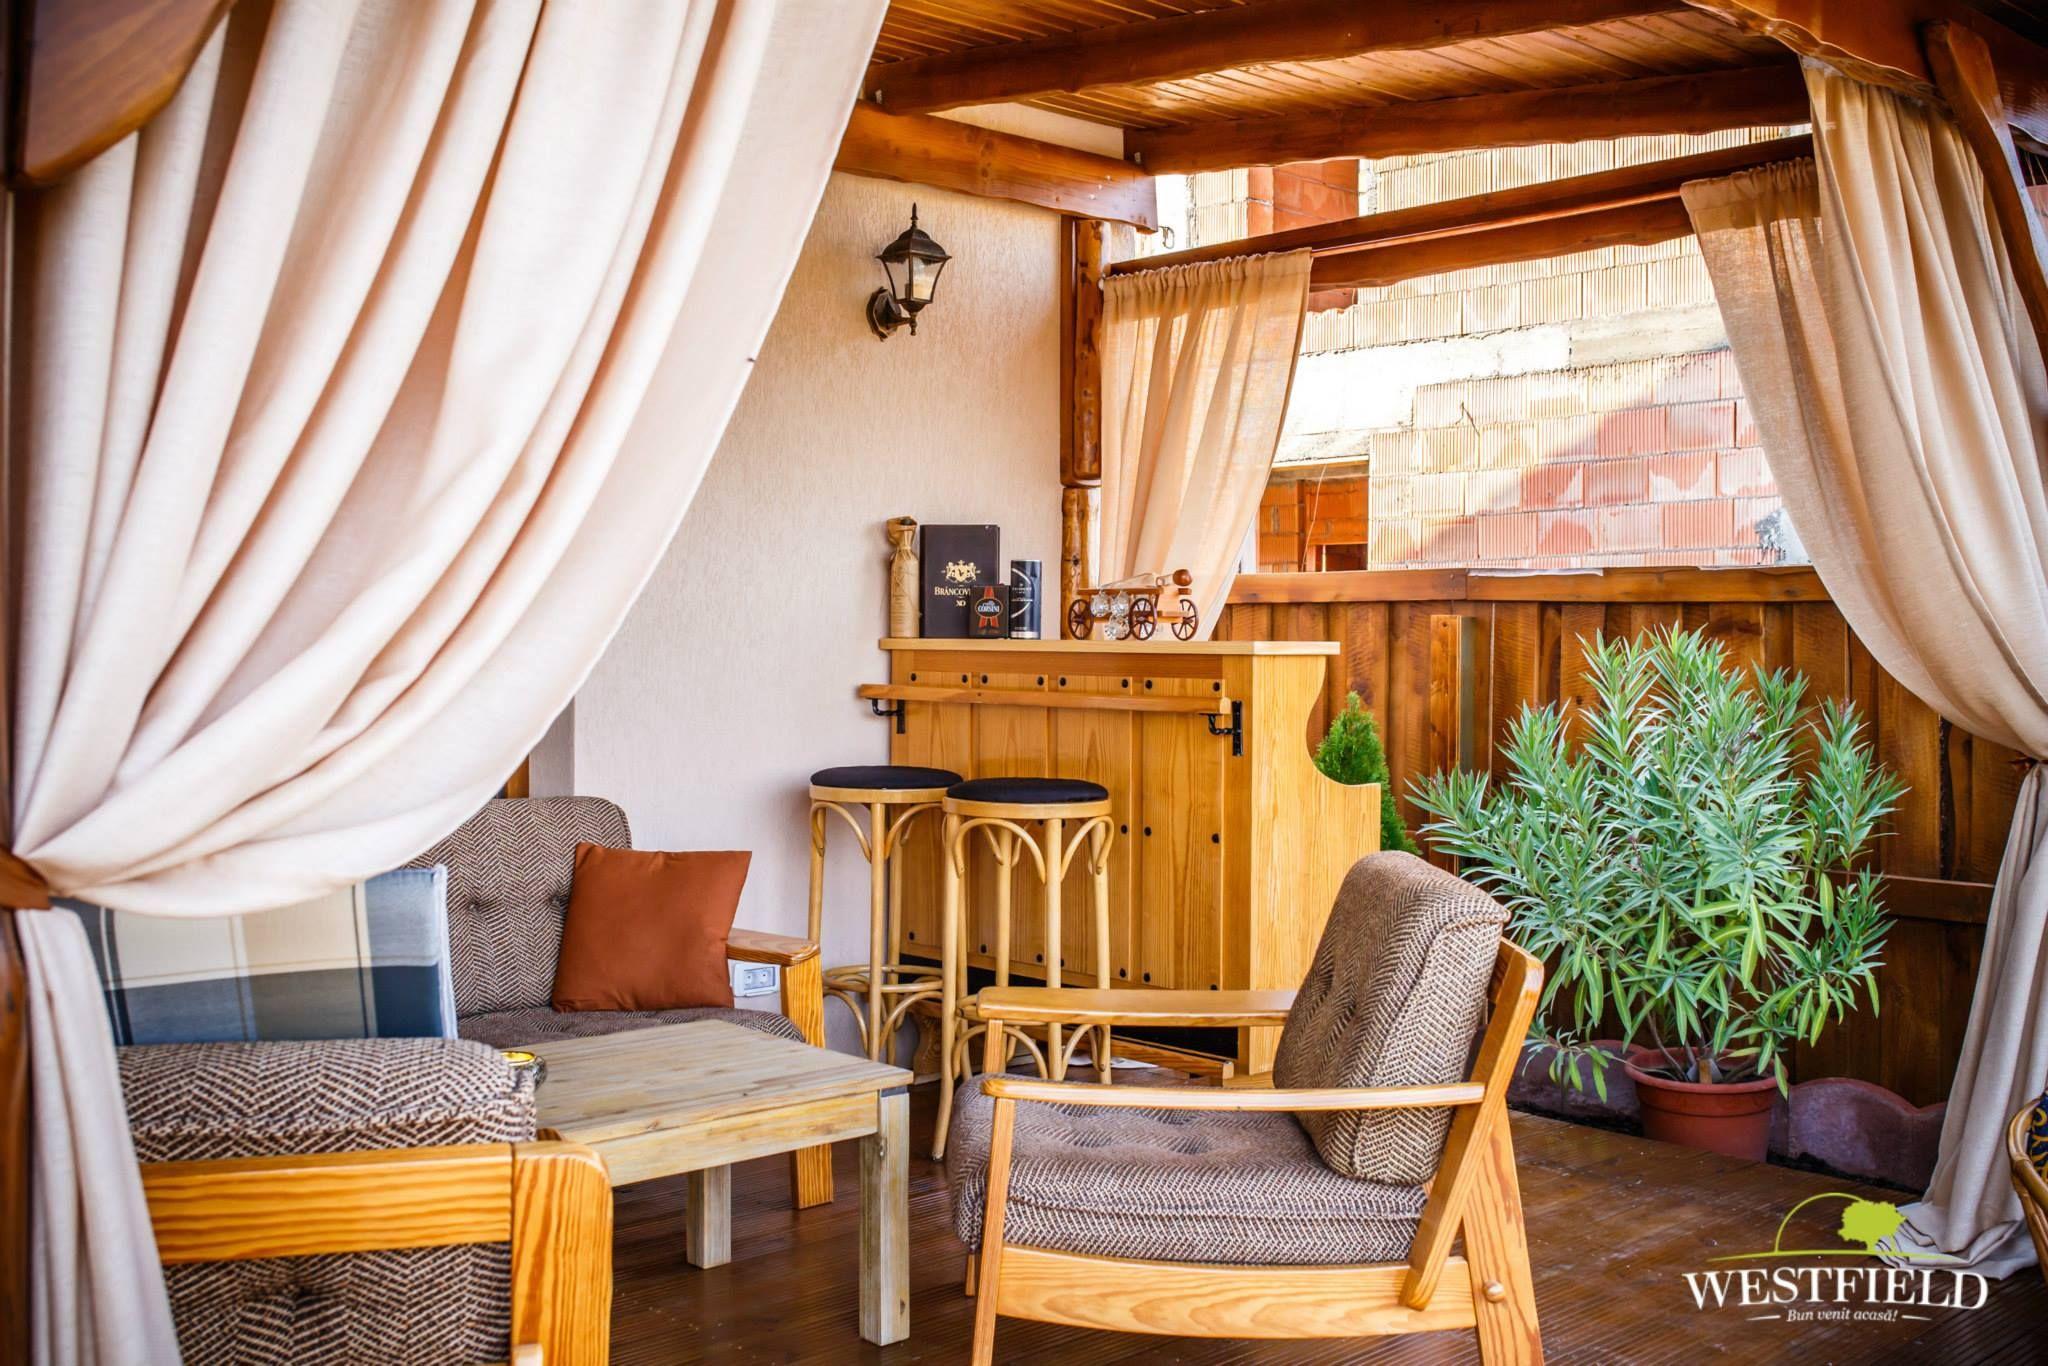 Decor de revistă, la rezidenții din #Westfield! #outdoor #yard #westfieldArad #home #decor #ideas #bestplaceintown #residential